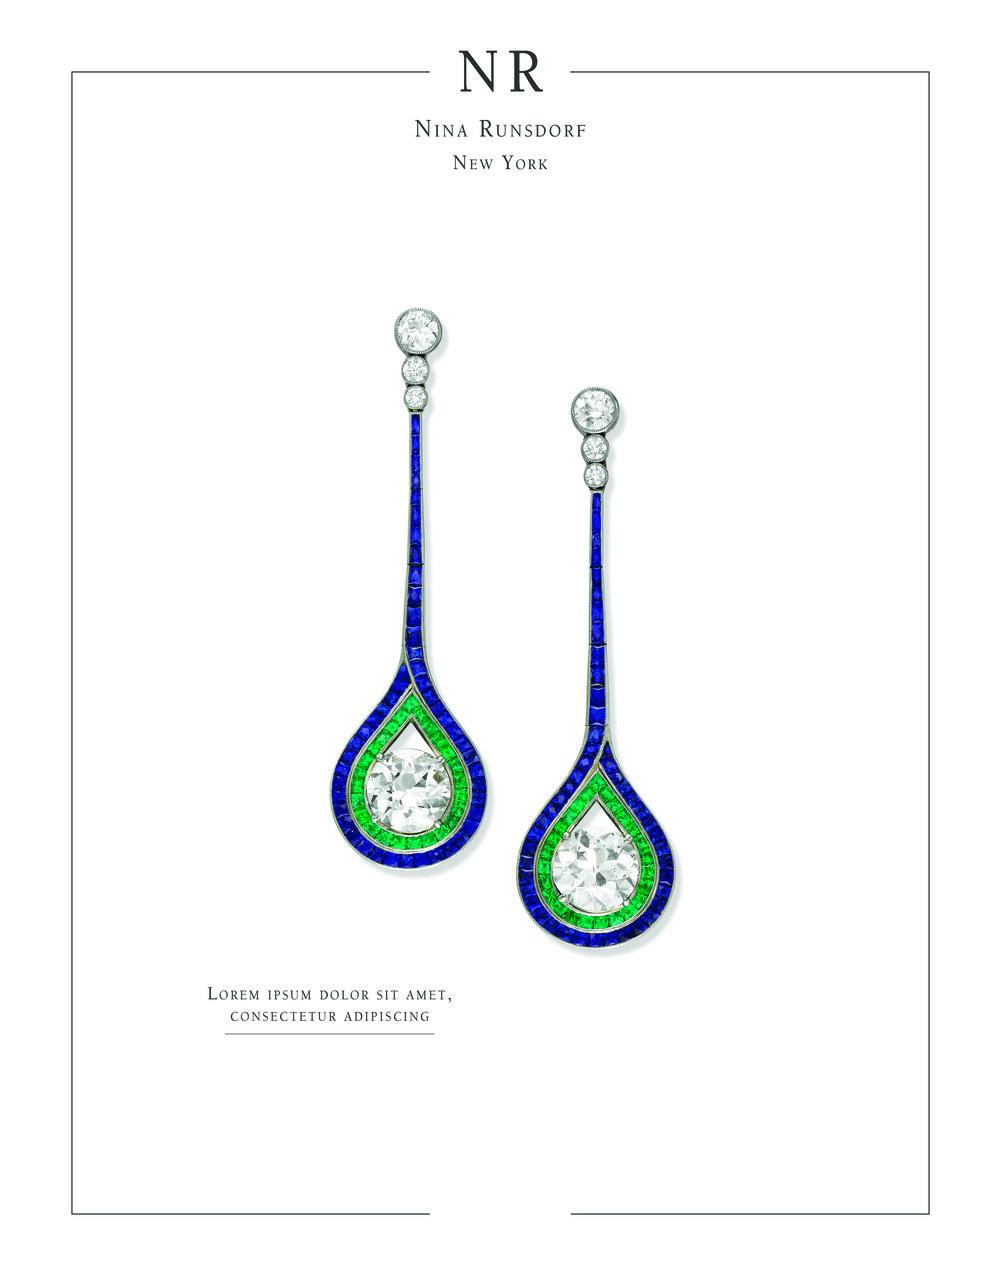 Nina Runsdorf Jewelry